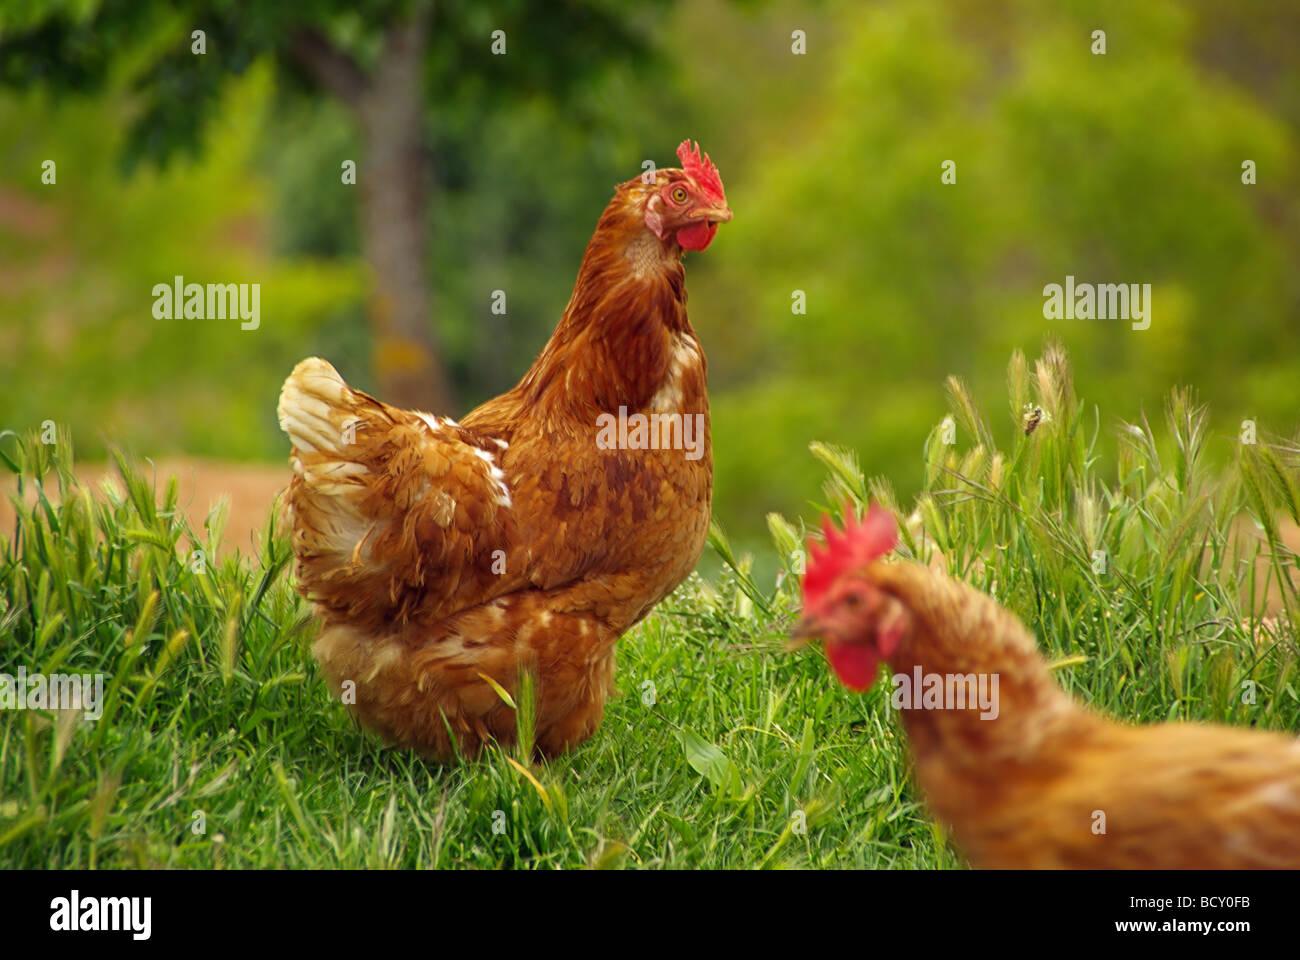 Huhn chicken 01 - Stock Image